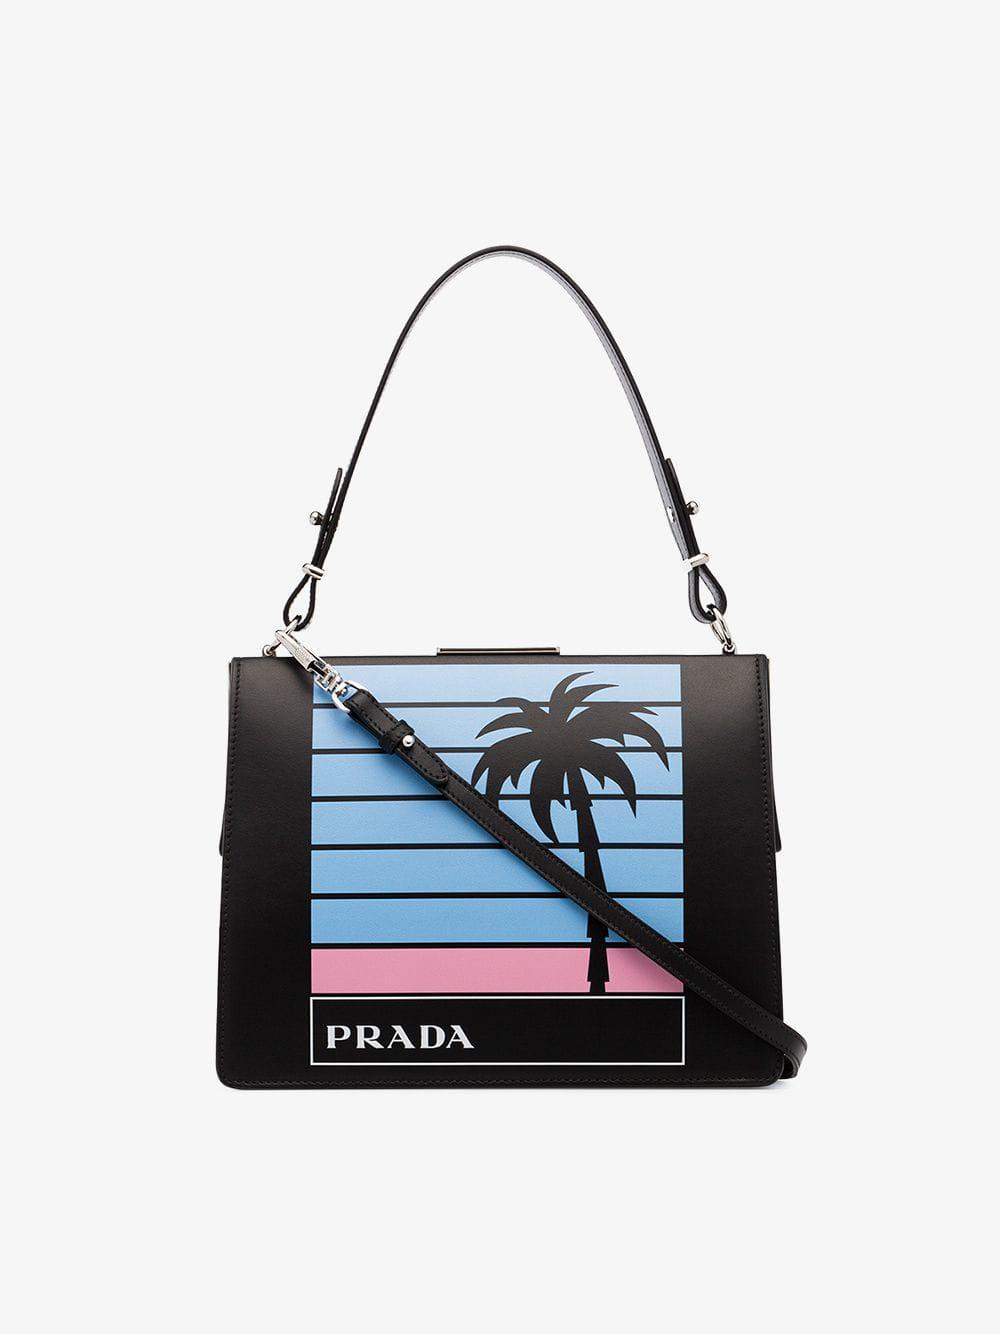 9b6734684f1b Lyst - Prada Black Light Frame Leather Bag in Black